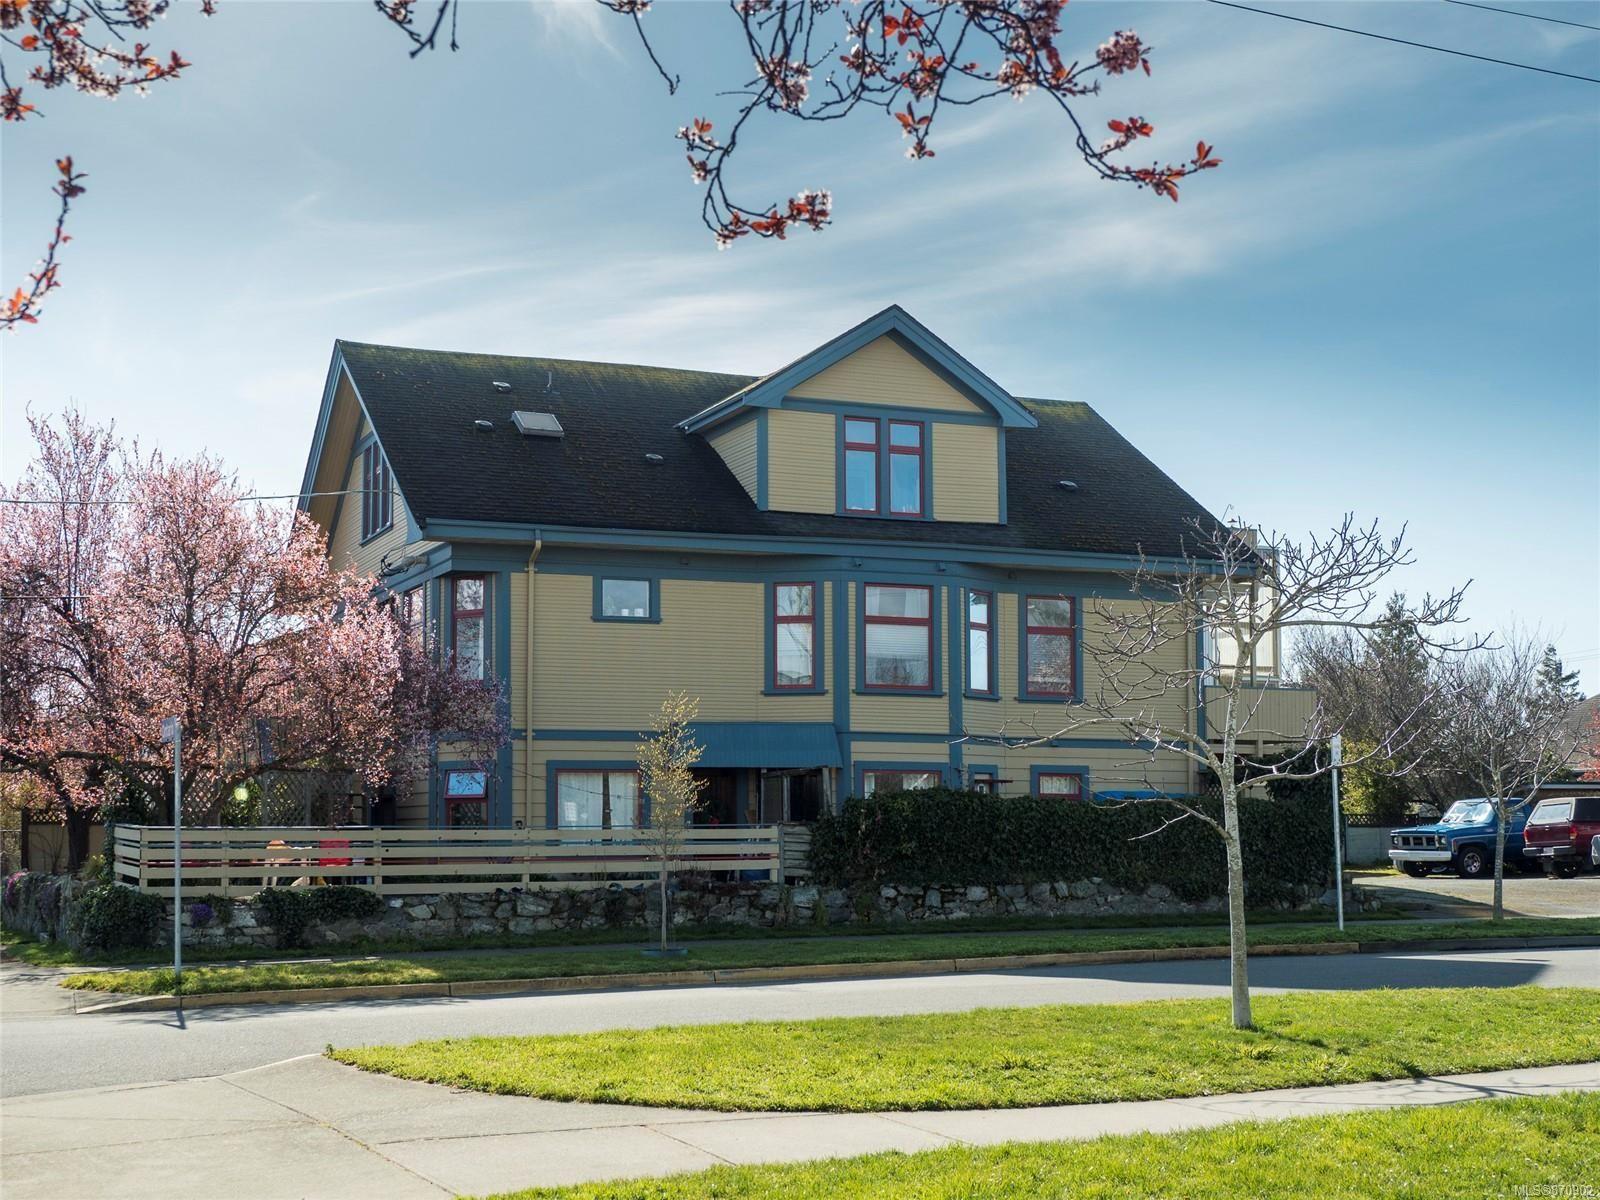 Main Photo: 101 Ontario St in : Vi James Bay Multi Family for sale (Victoria)  : MLS®# 870902